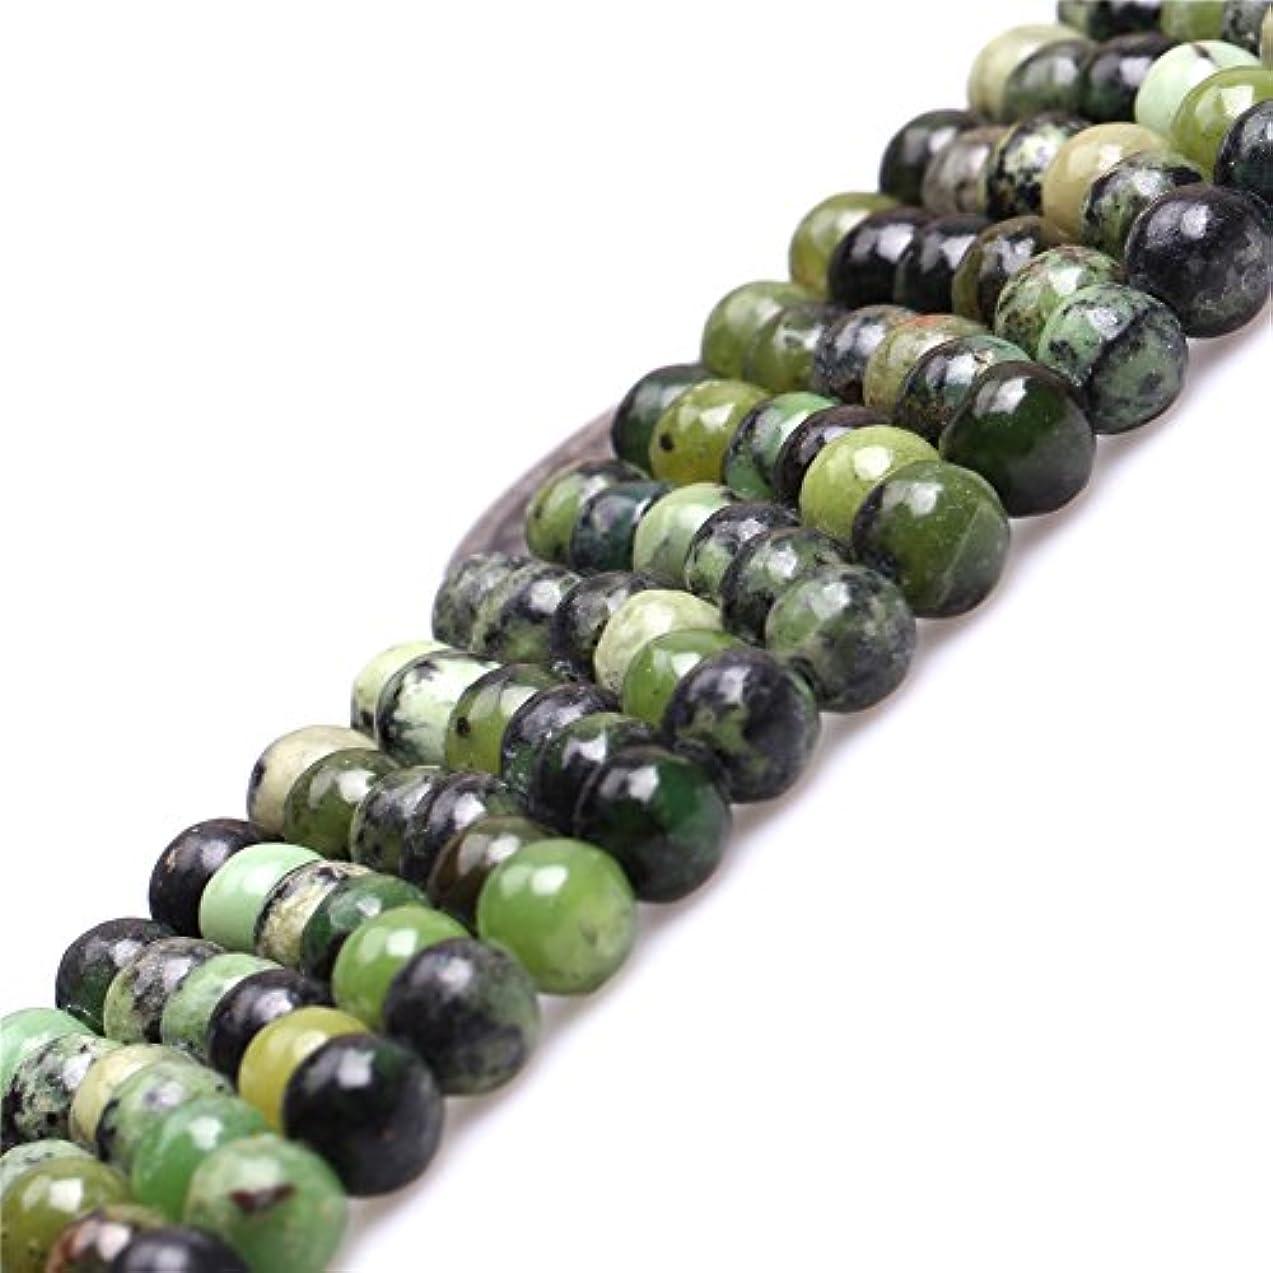 JOE FOREMAN 6mm Green Grass Turquoise Semi Precious Gemstone Round Loose Beads for Jewelry Making DIY Handmade Craft Supplies 15